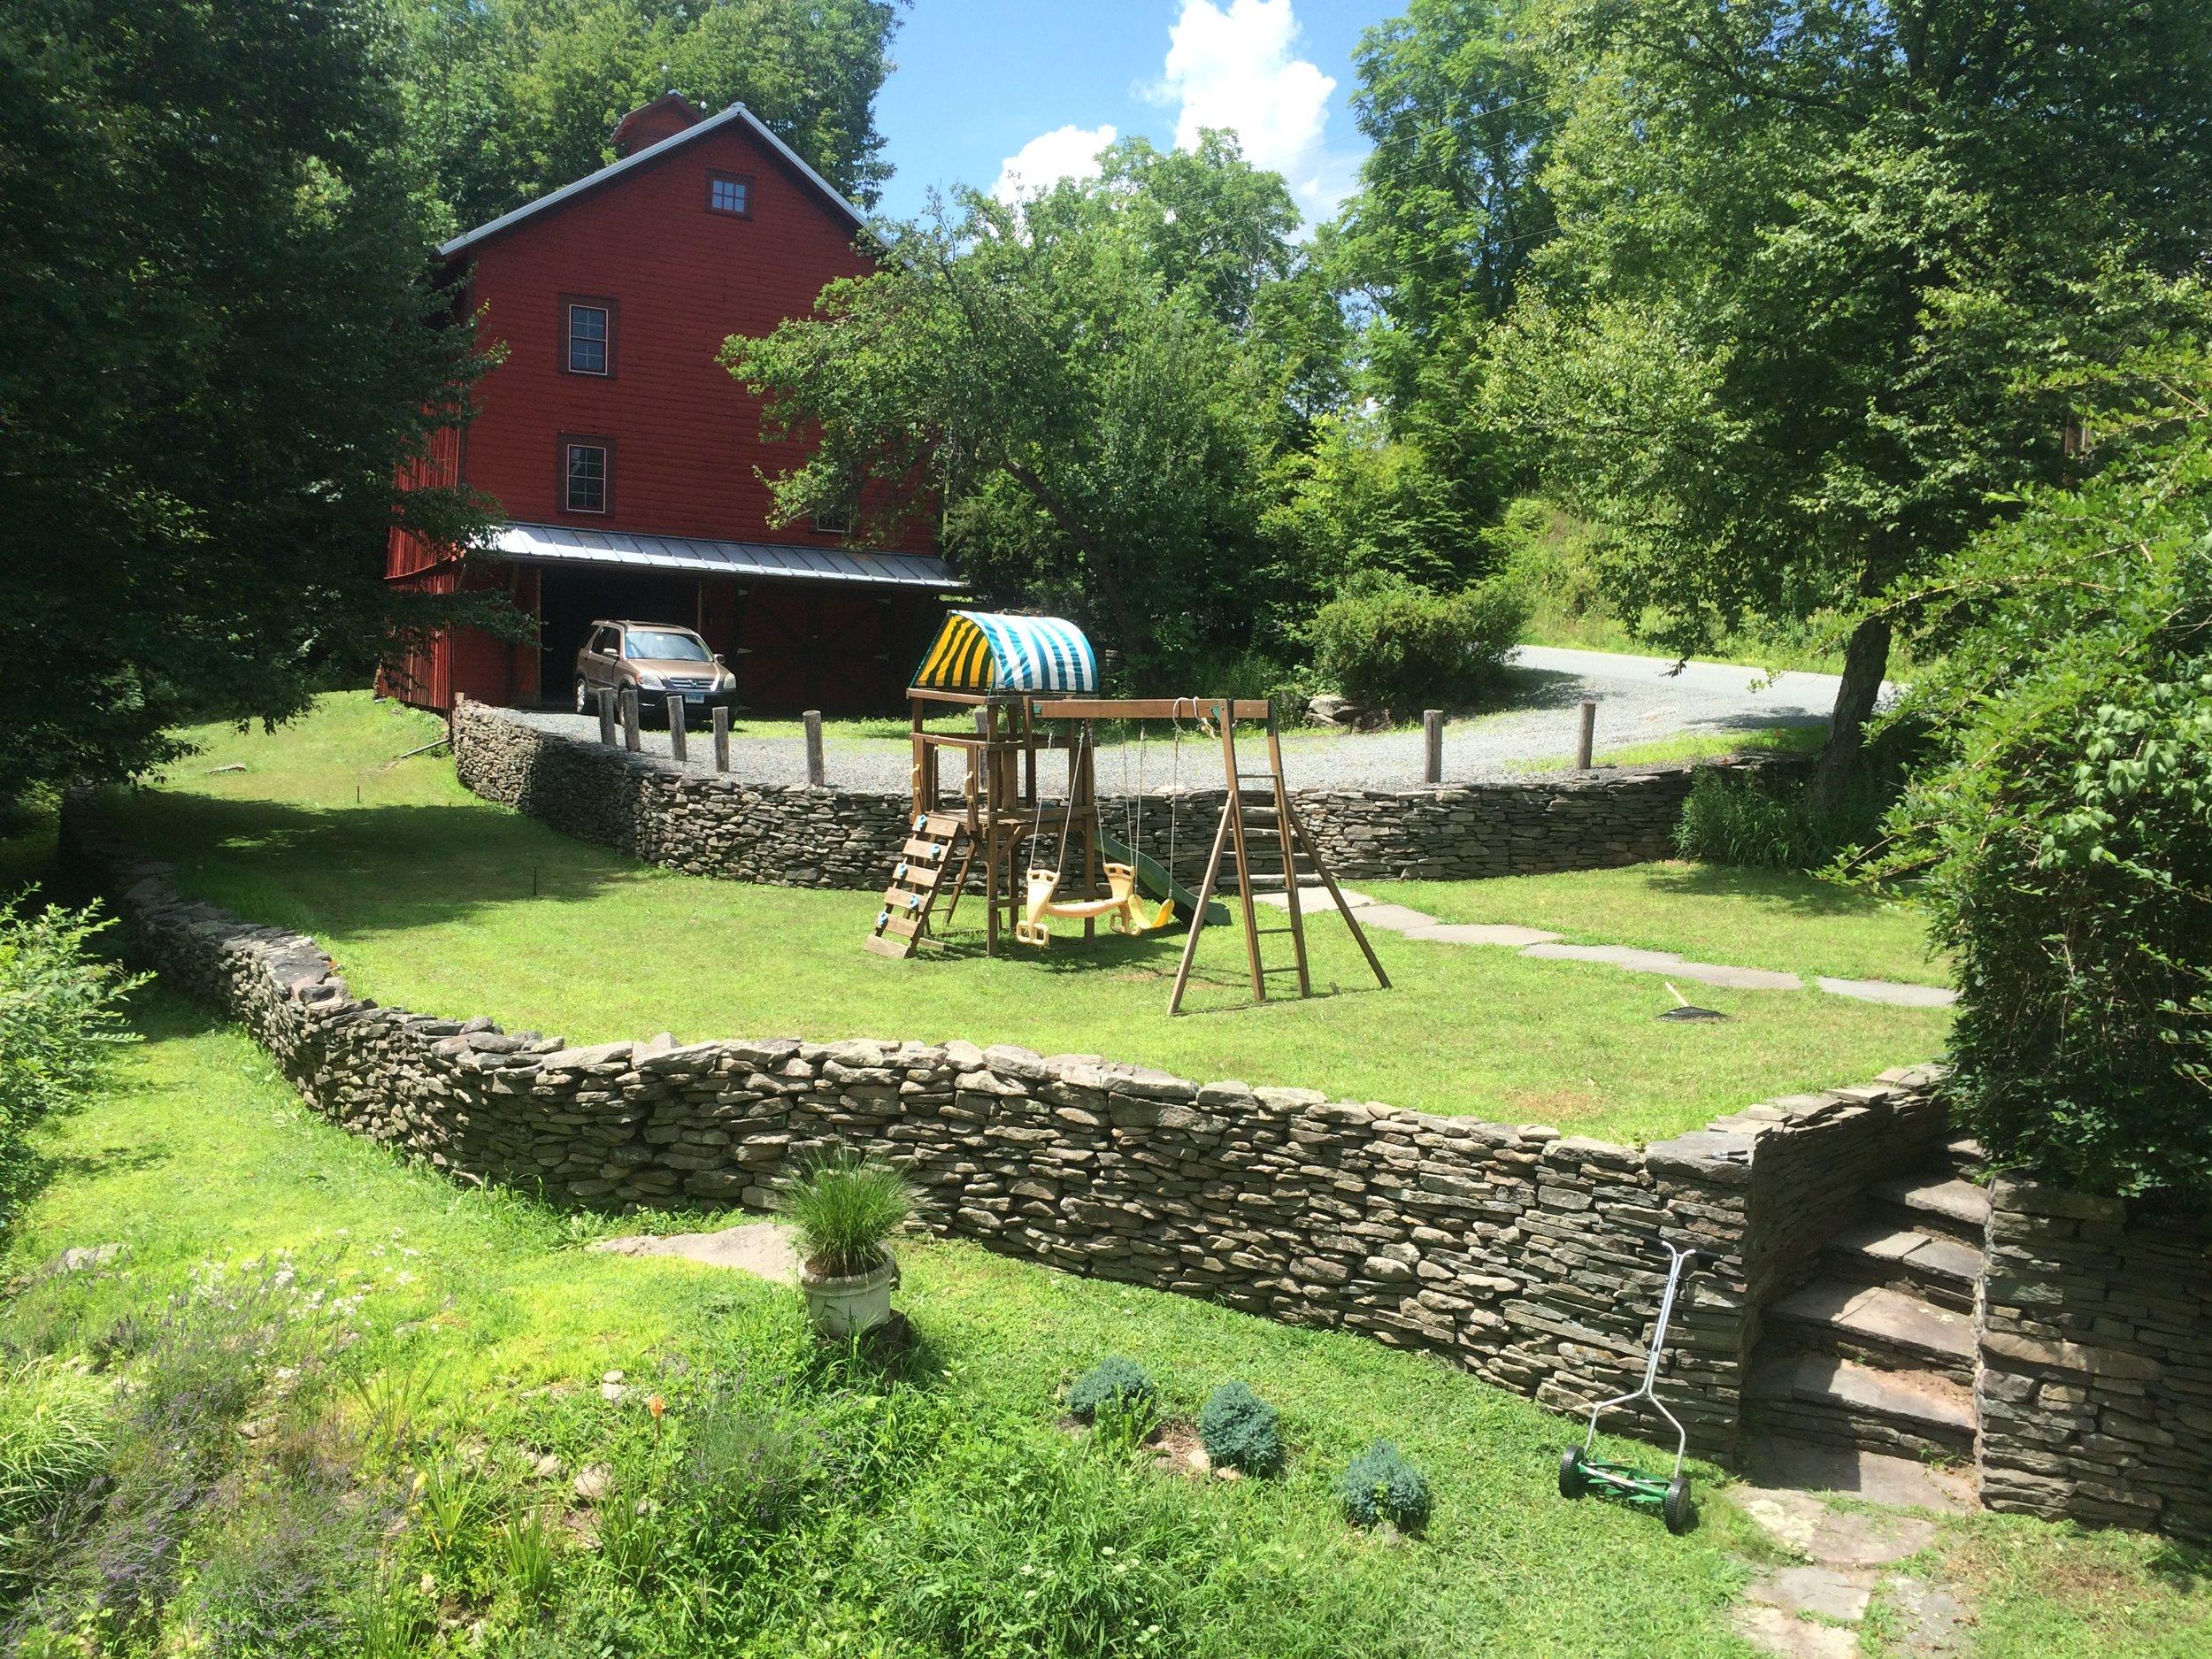 barnyard.JPG